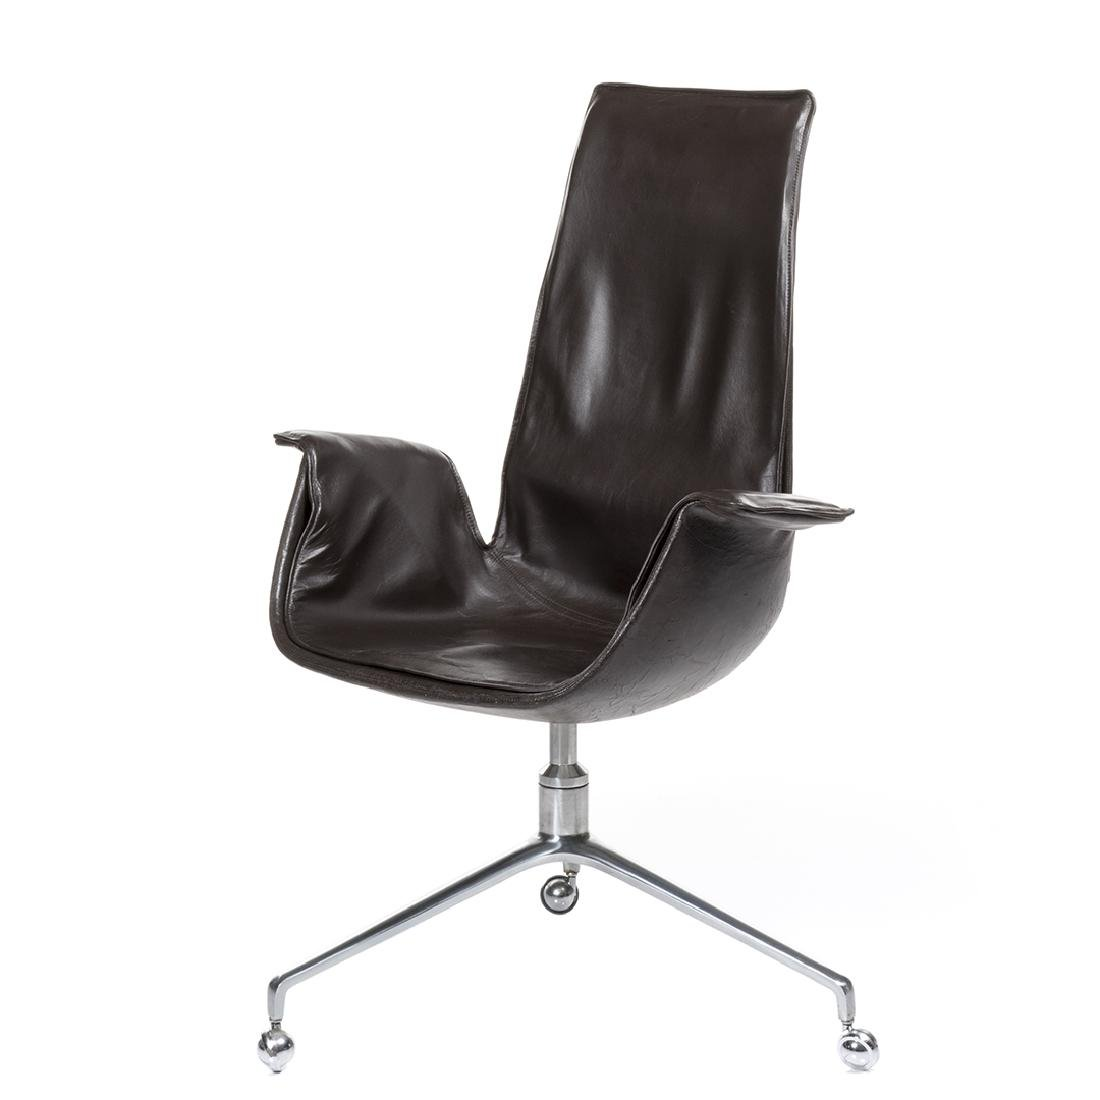 Preben Fabricius Tulip Chair